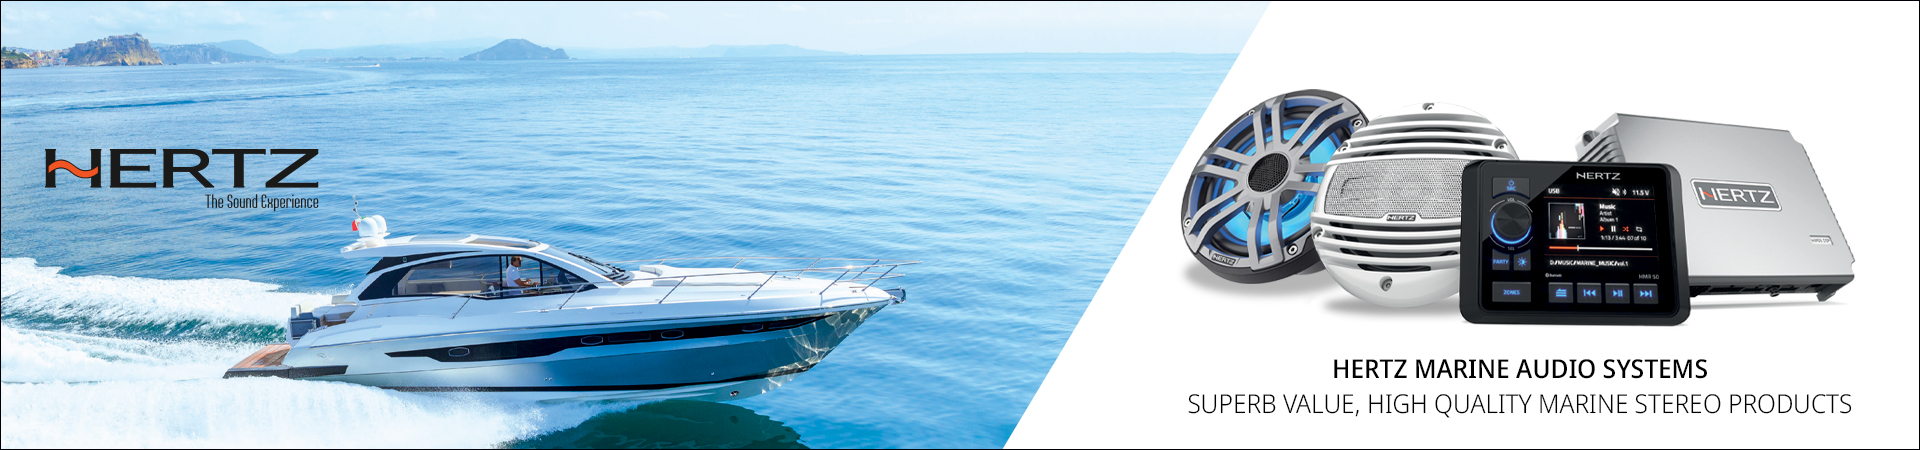 New Hertz Marine Audio